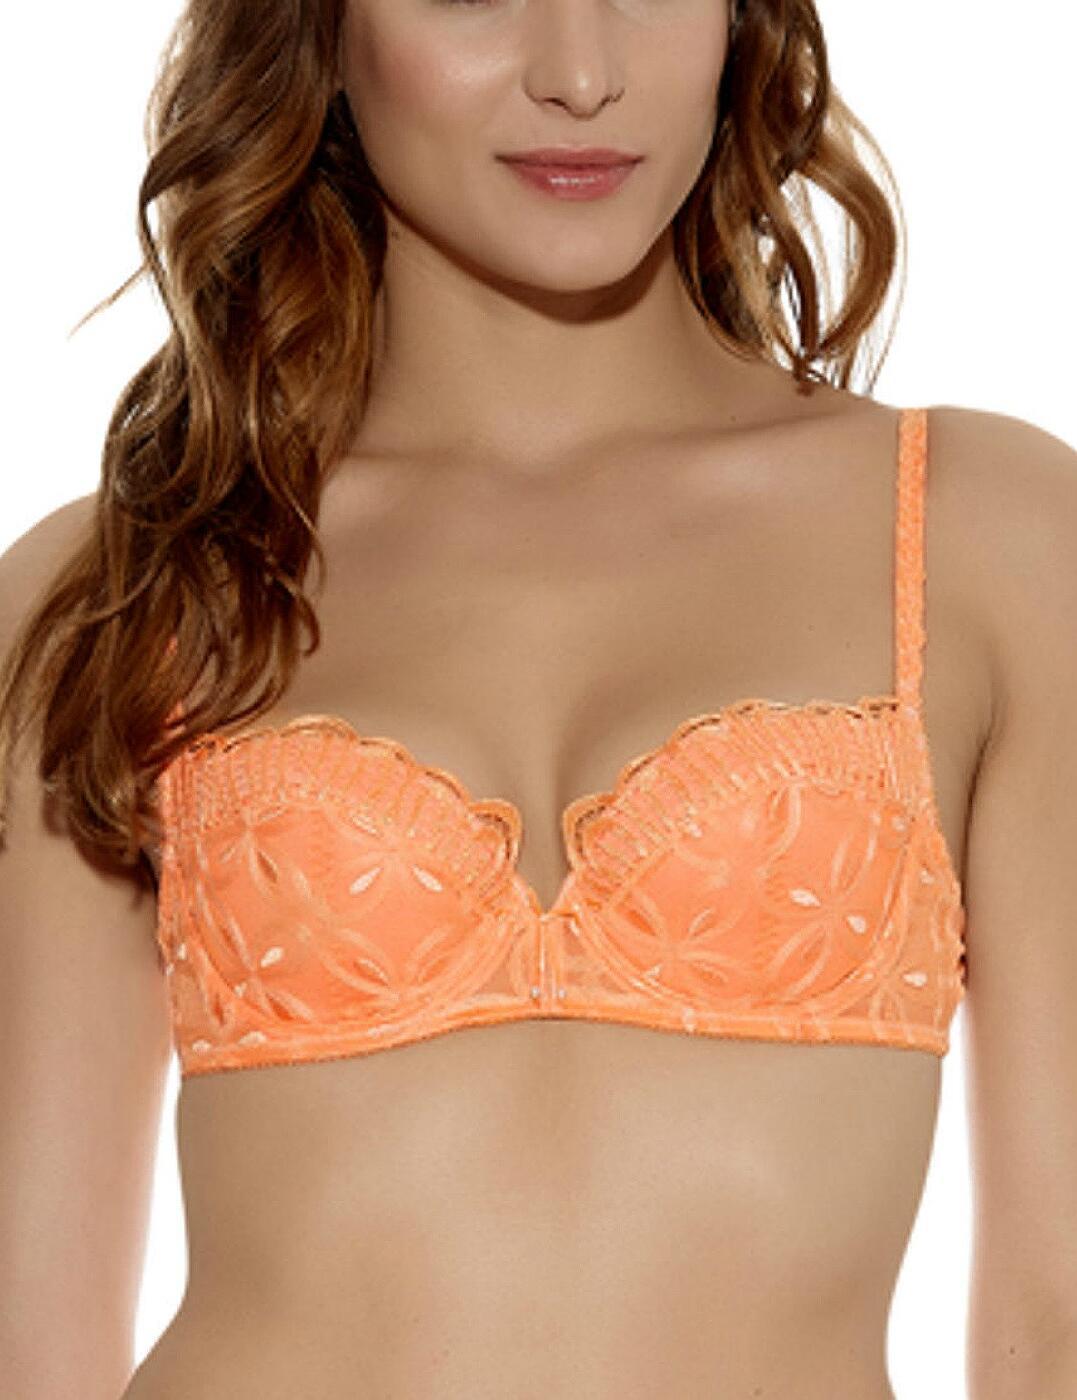 102002 Wacoal Melodie Foam Lined Balcony Bra - 102002 Cantaloupe Orange